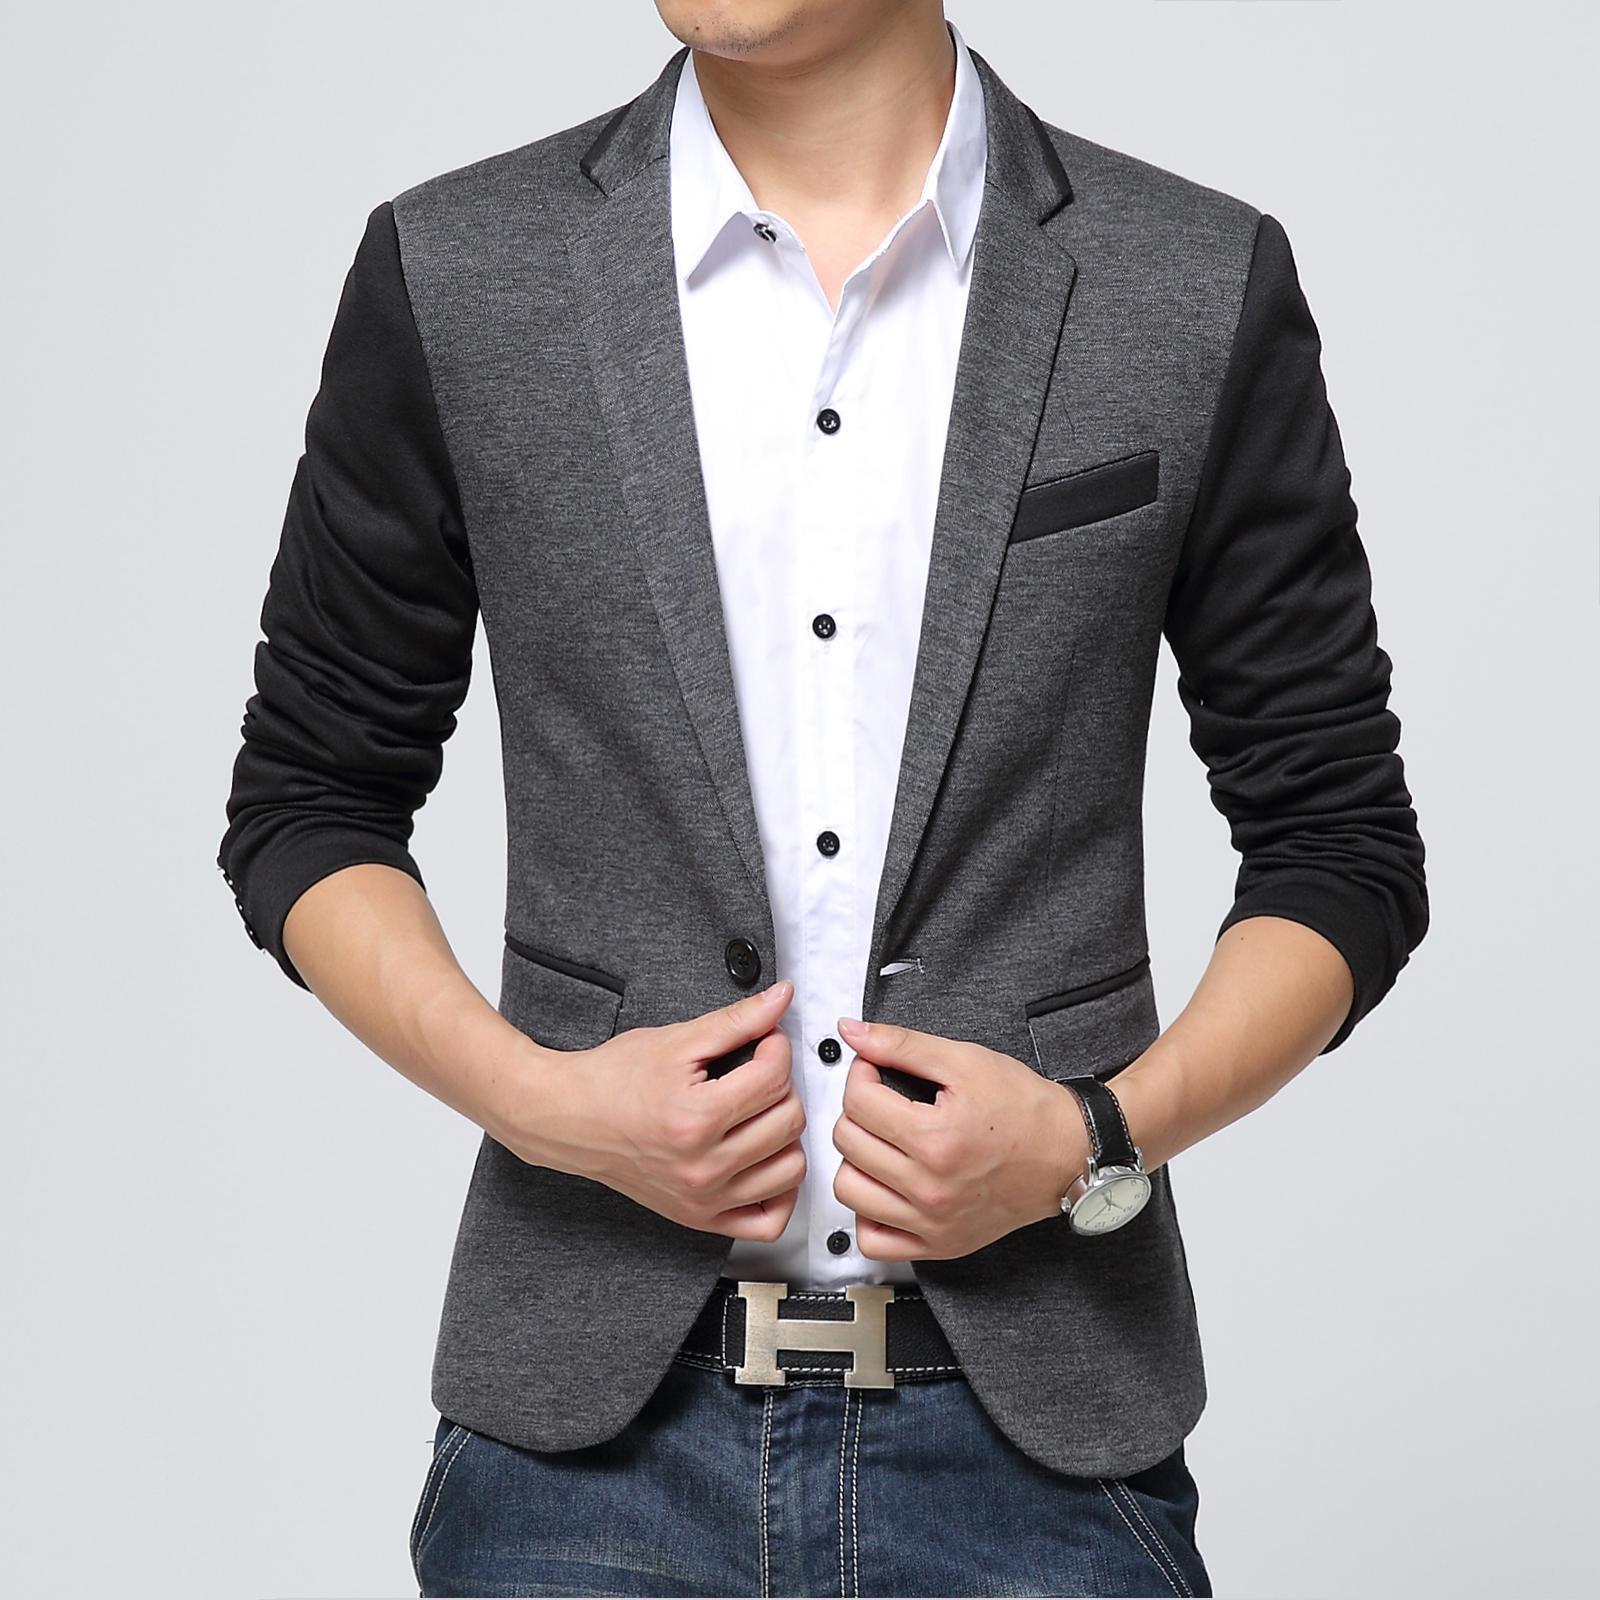 New Style Men Blazer 2016 Suit Men Brand Casual Jacket Latest Coat ...